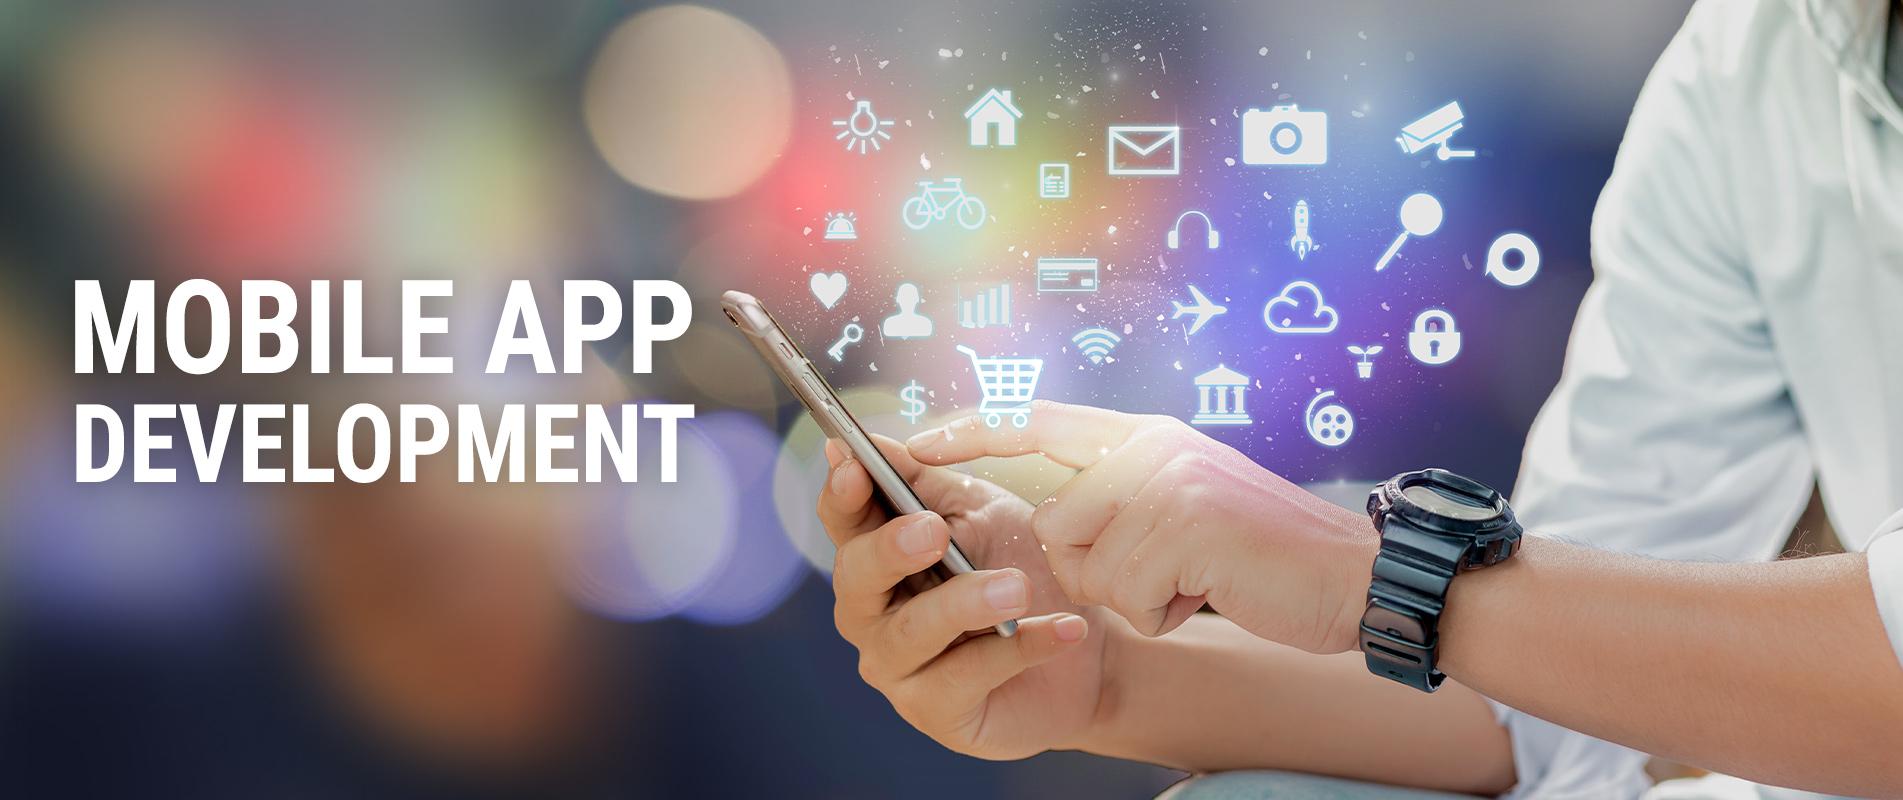 Mobile App Development |